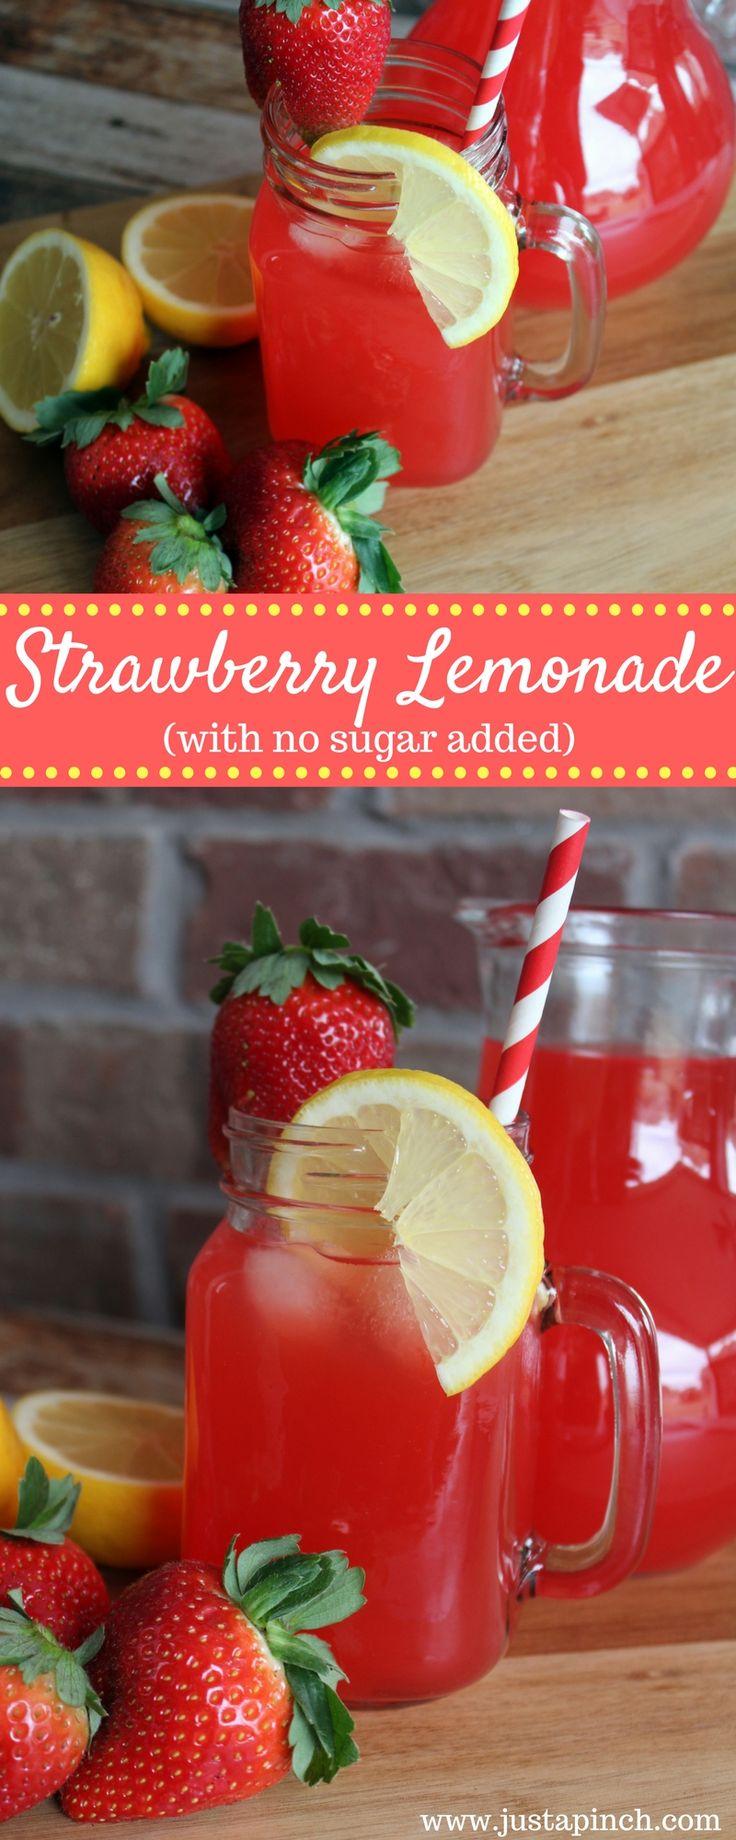 Strawberry lemonade with no sugar added